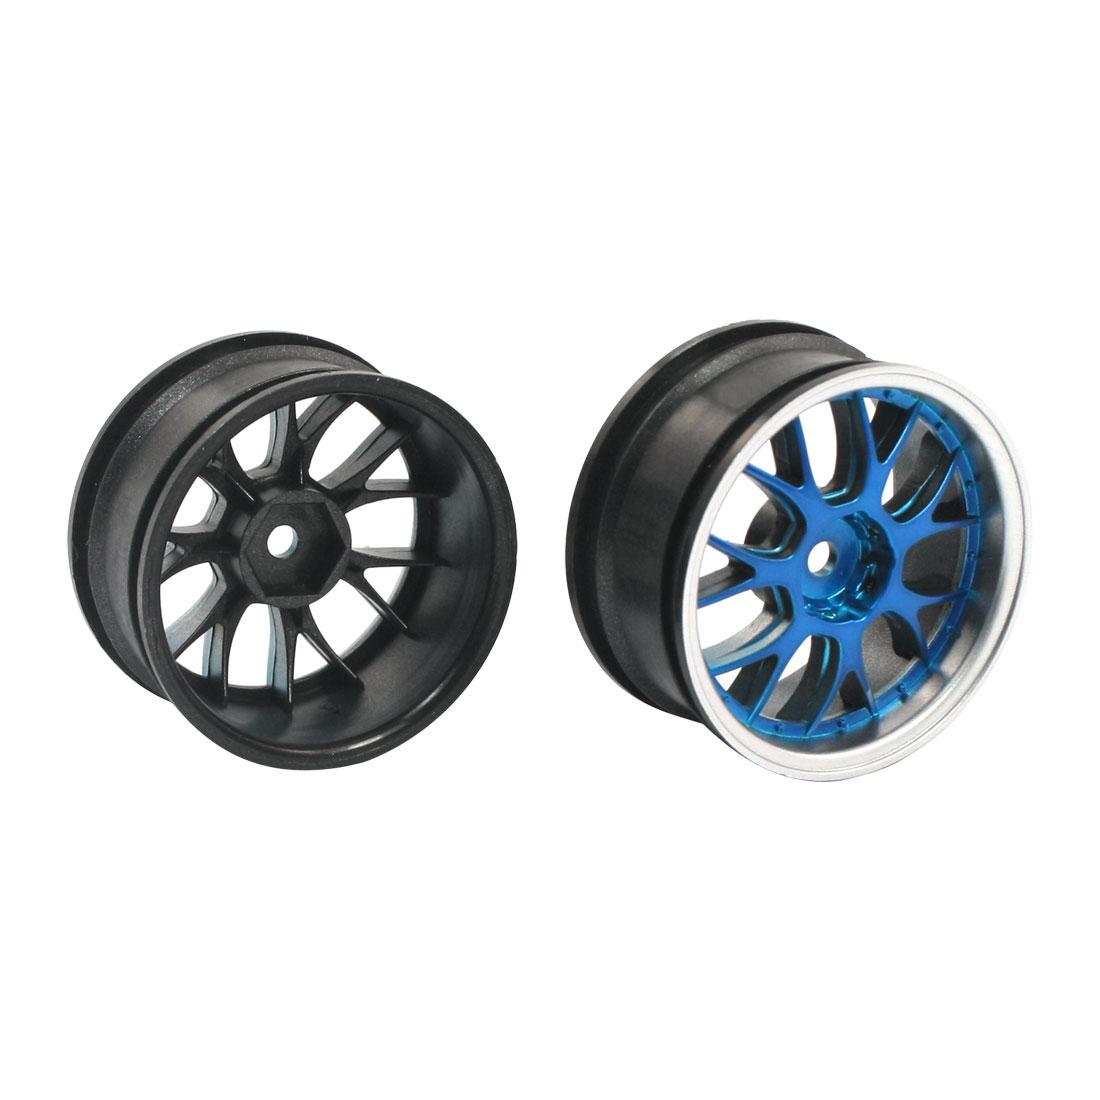 2pcs Black 1:10 RC Model Flat Racing Car Truck Hard Tyre 52mm Wheel Tire